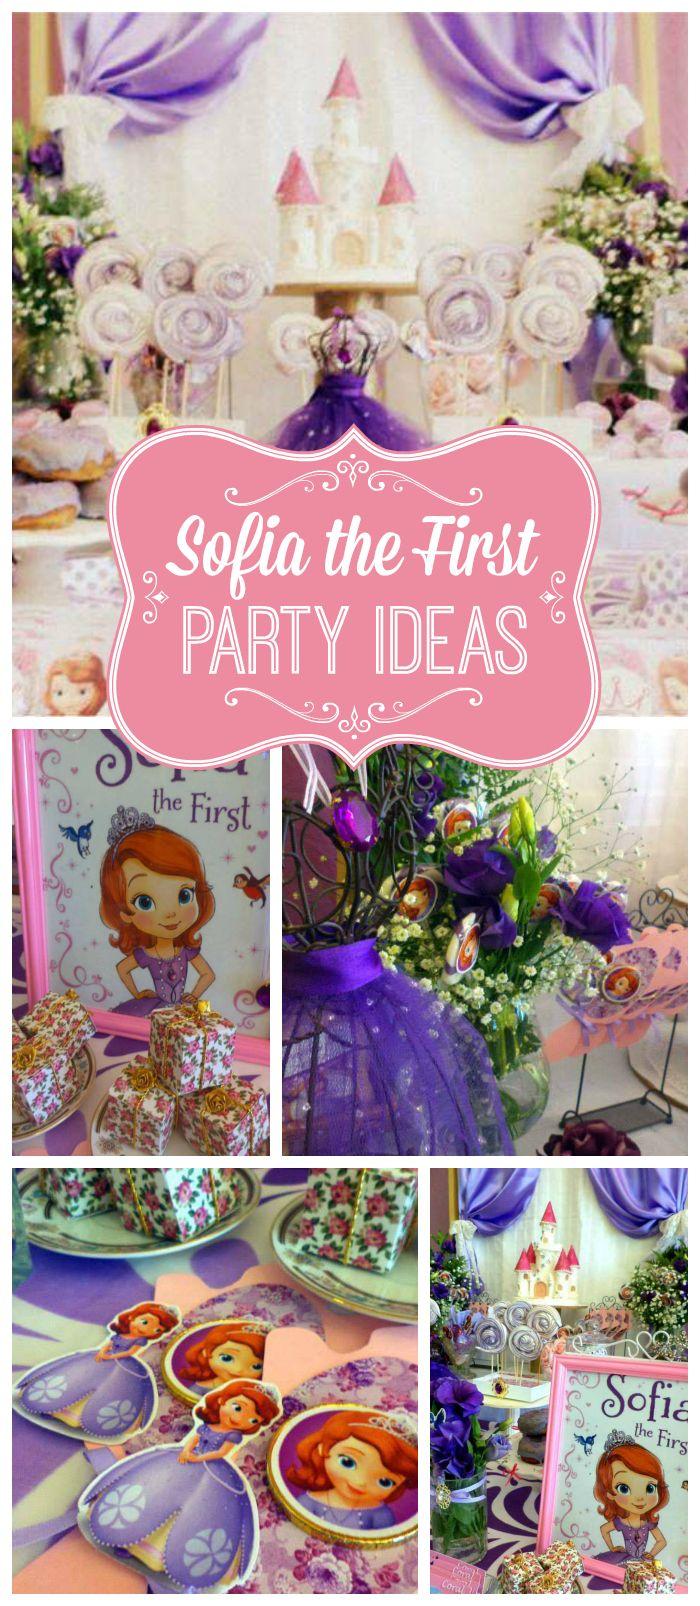 best princesa sofía images on pinterest princess sofia